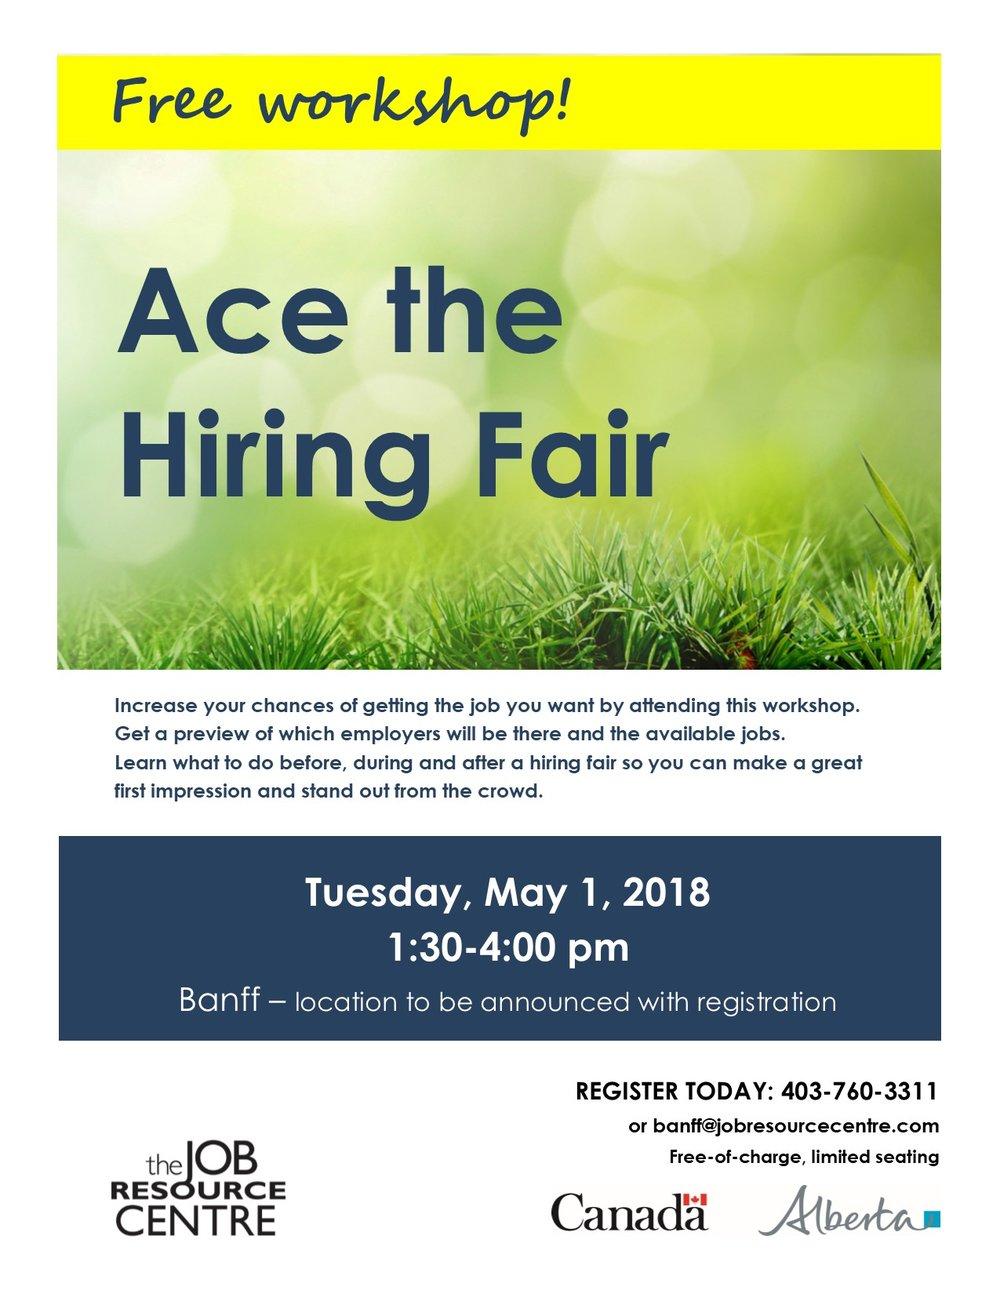 Banff Ace the Hiring Fair poster spring 2018 (1).jpg